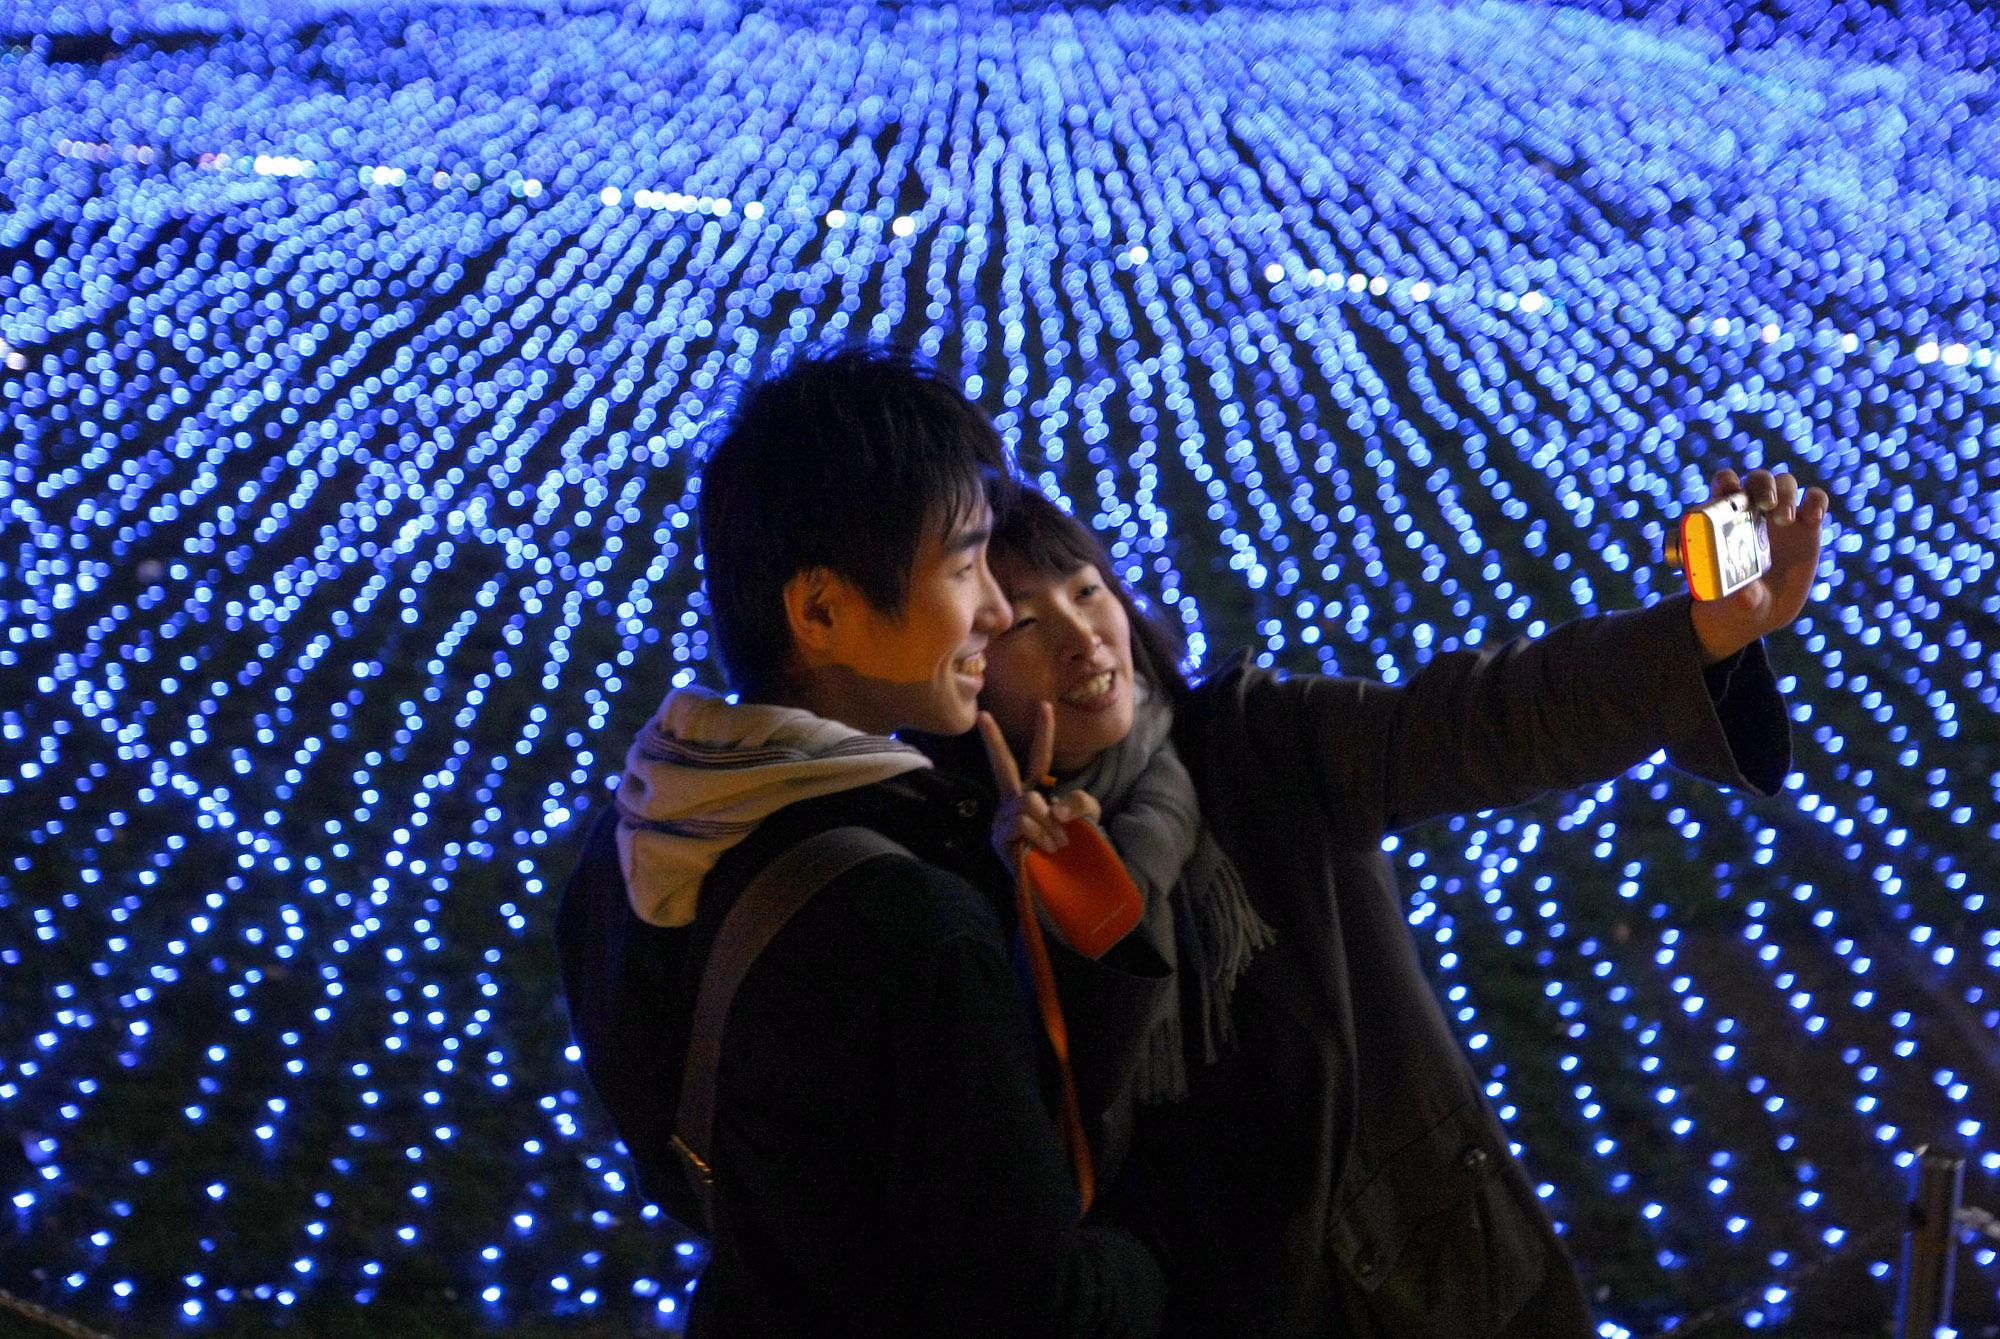 Рождество в Японии|Christmas in Japan|Курисумасу